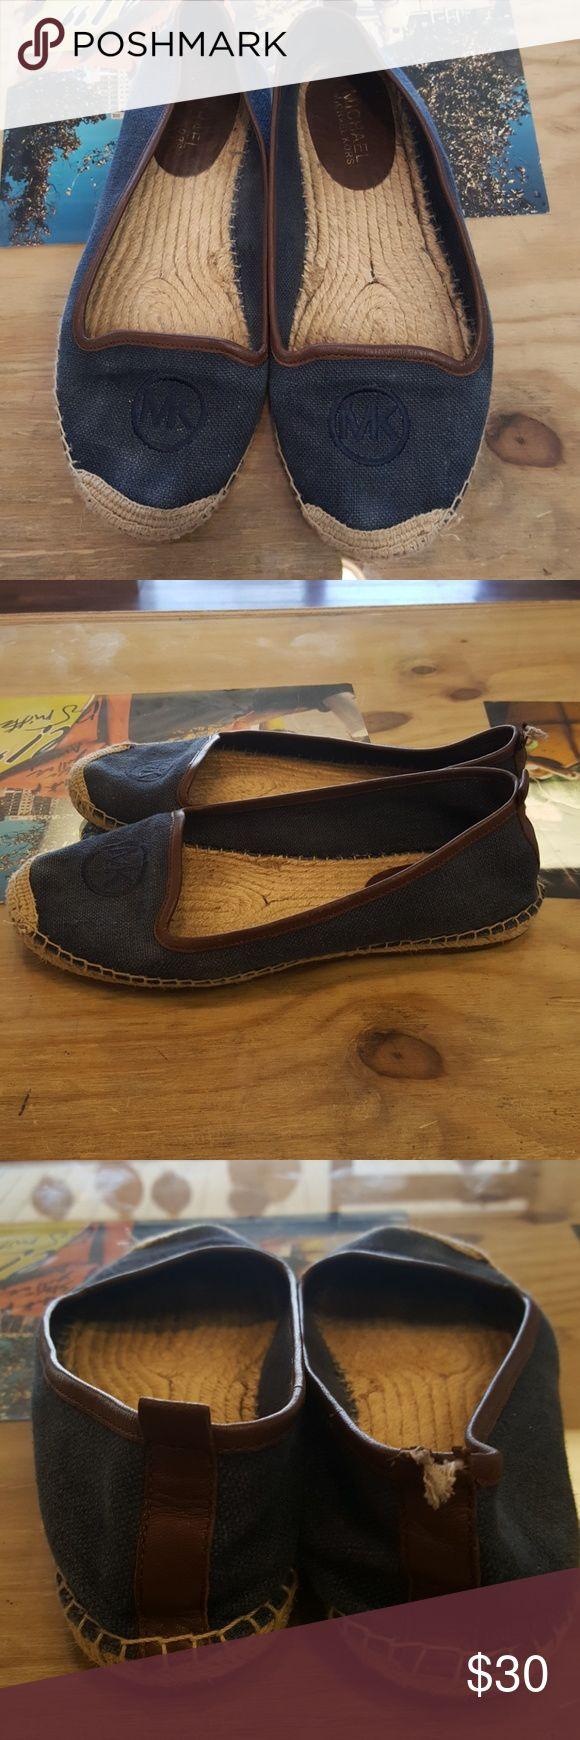 Michael kors flats Michael kors woven flats with jean material Michael Kors Shoes Flats & Loafers